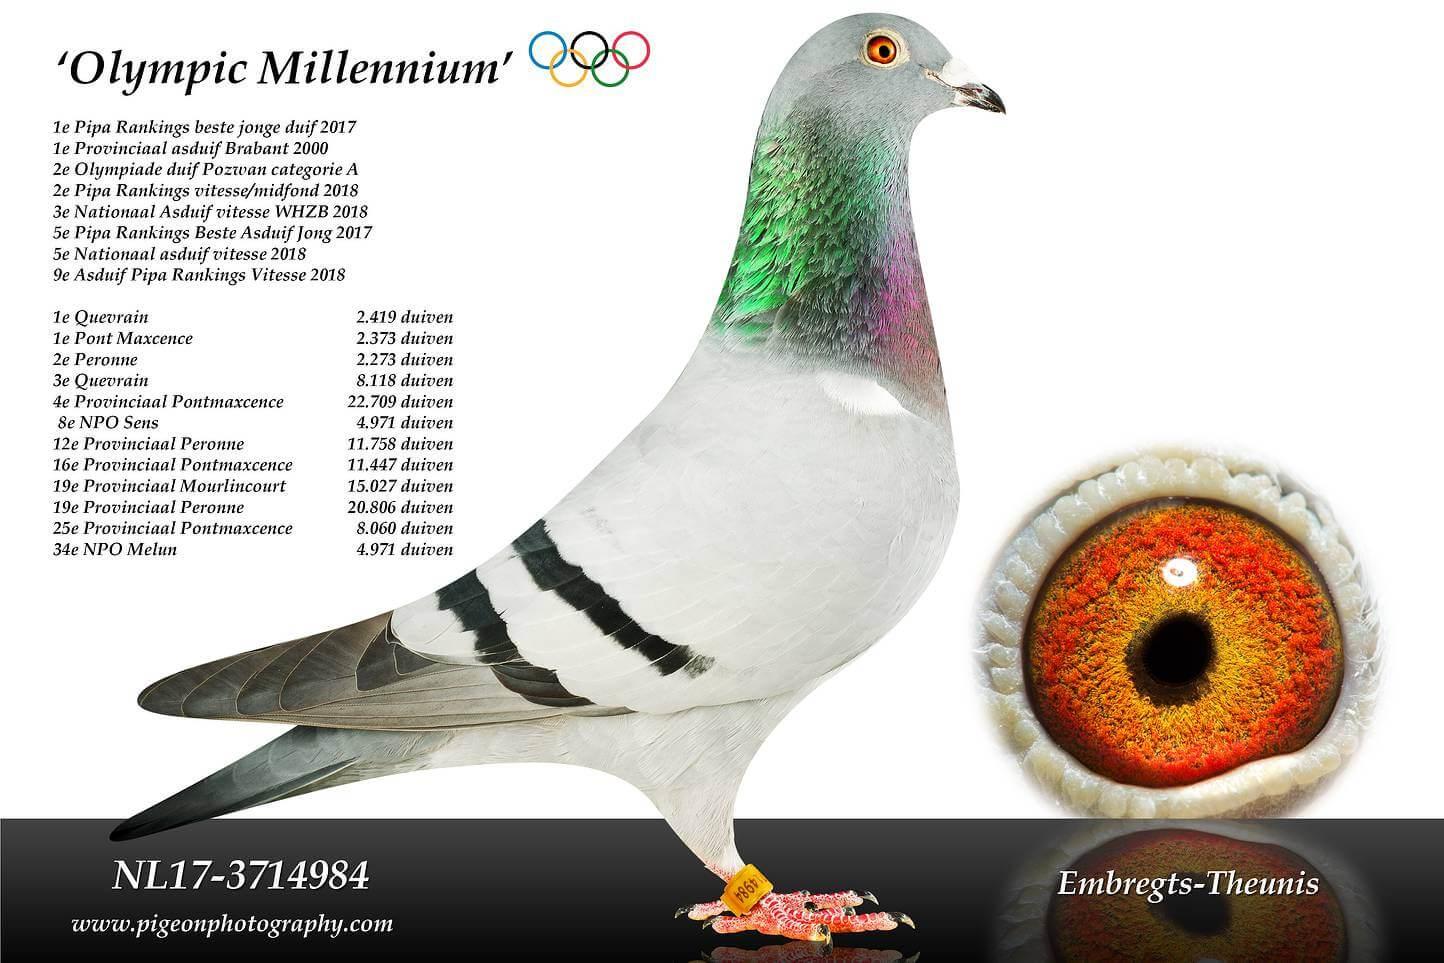 Olympic-Millennium-NL17-3714984